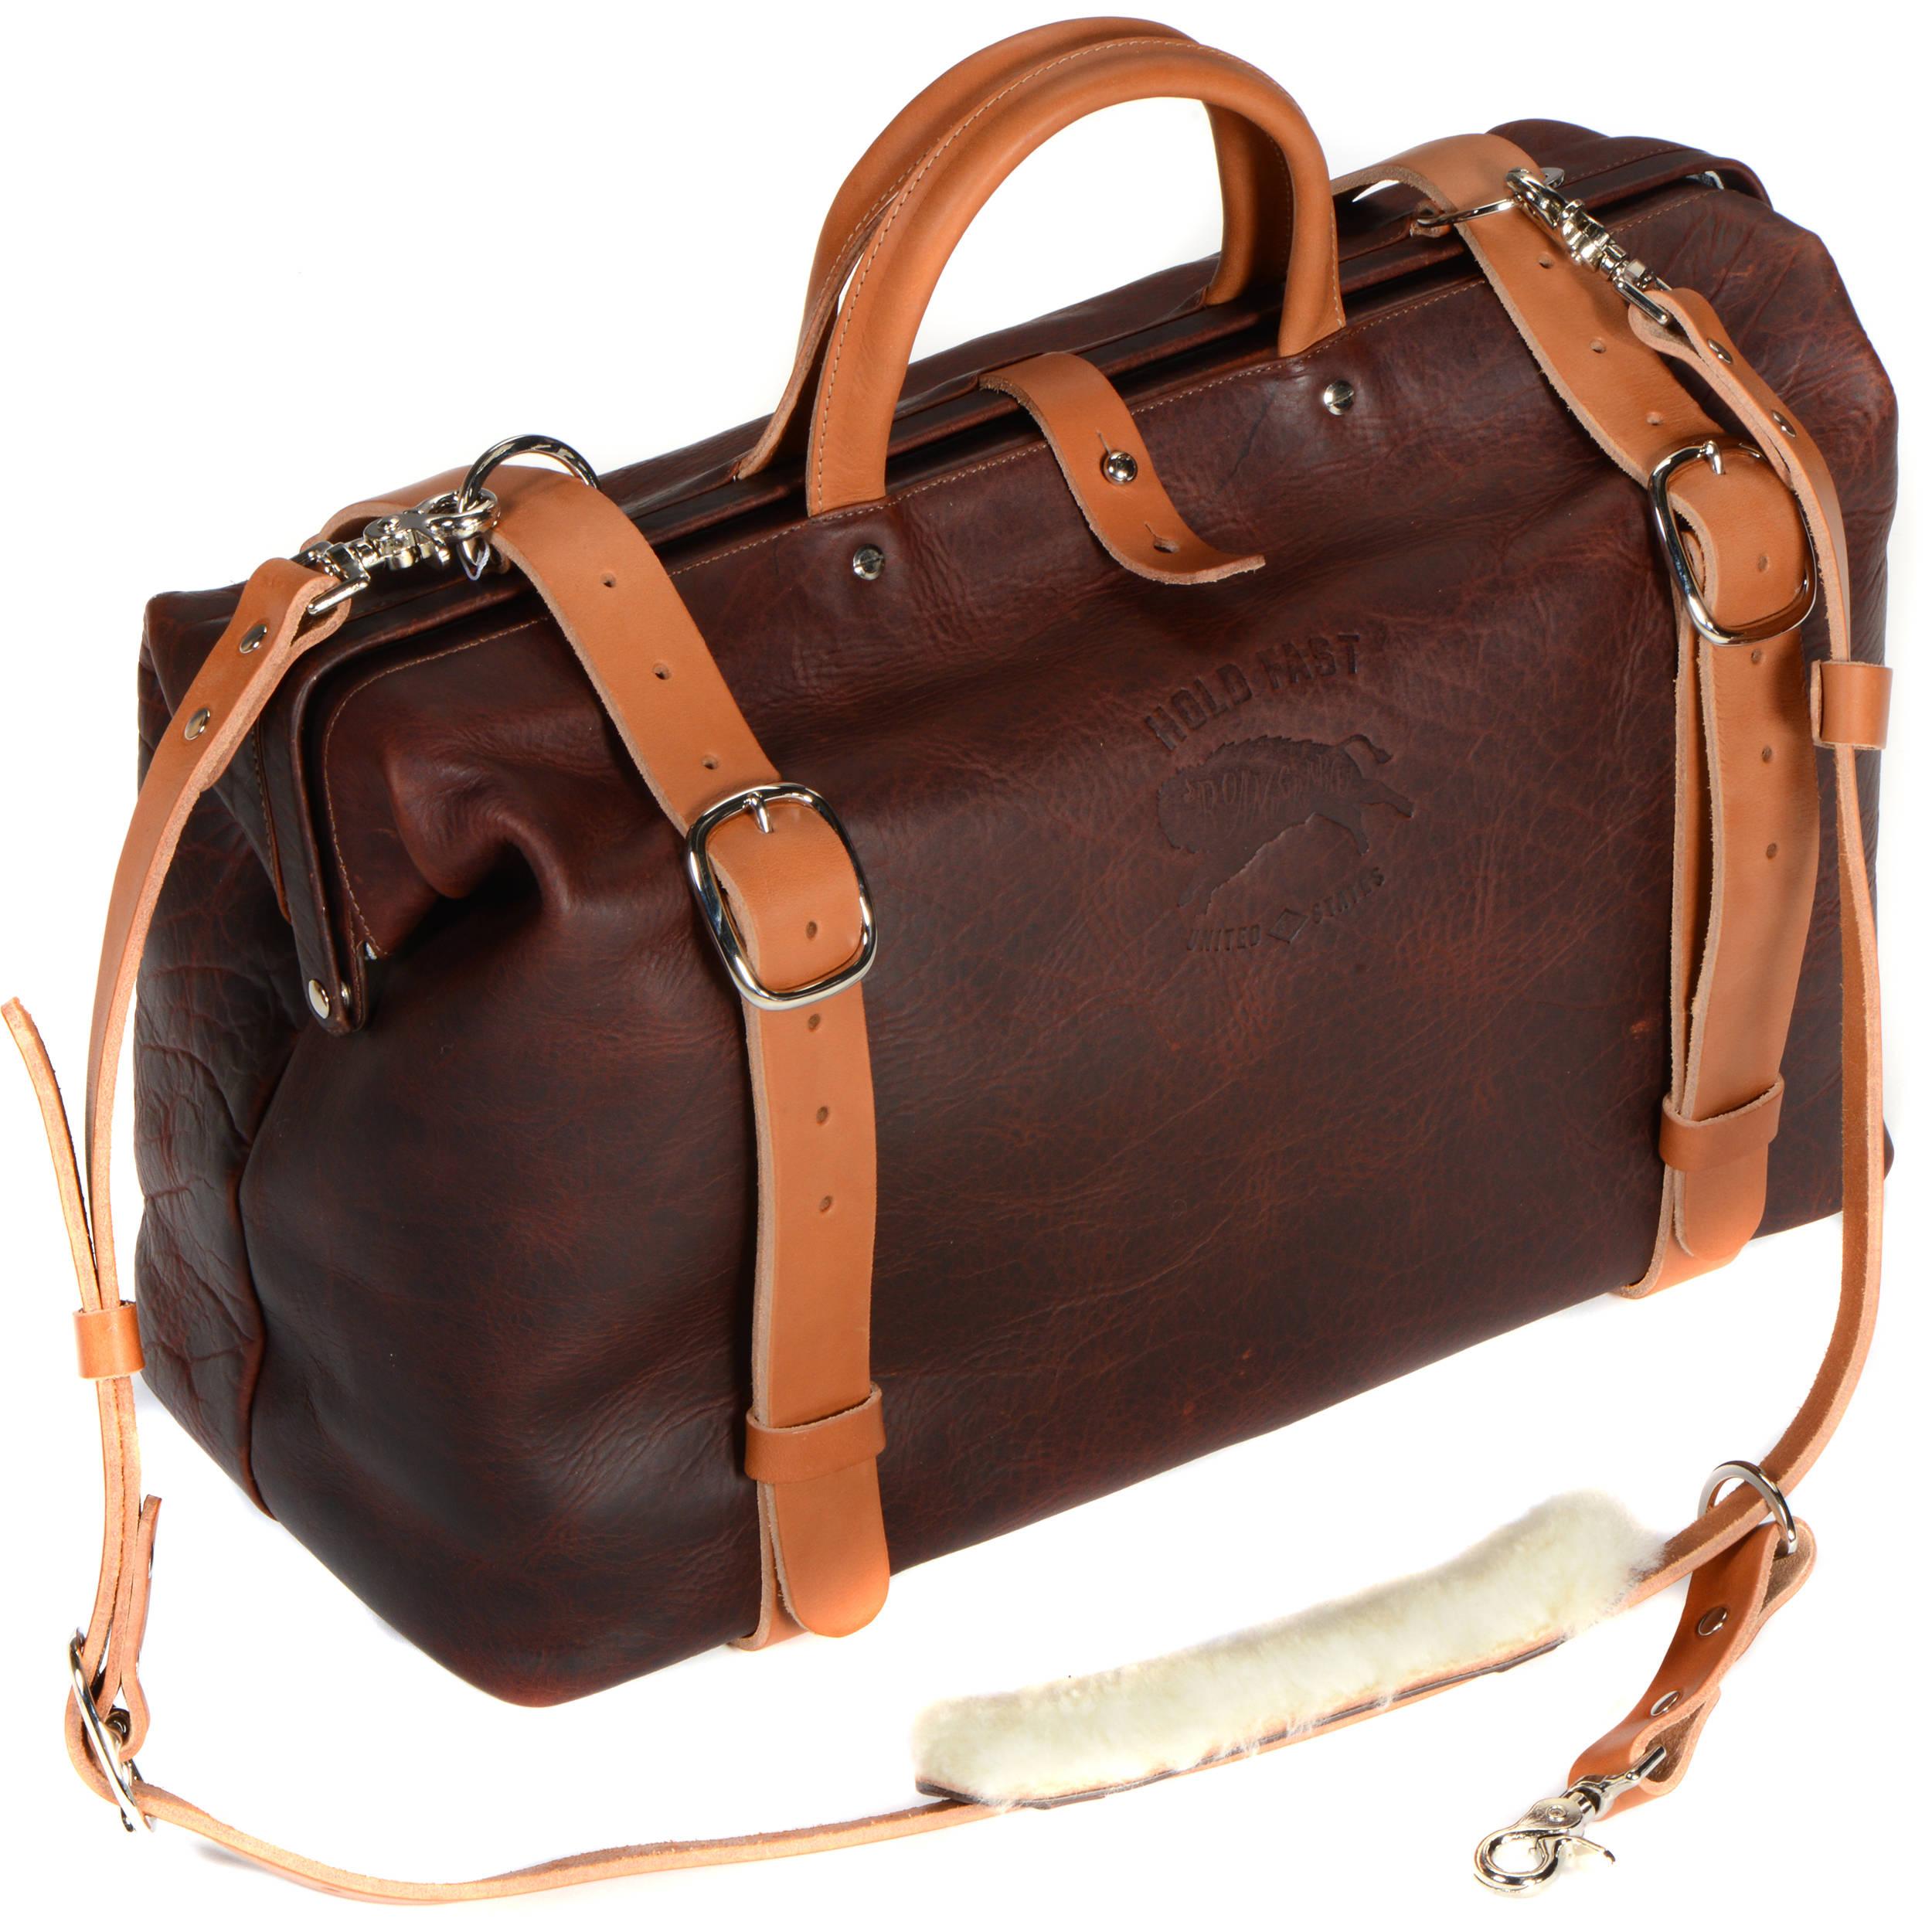 Camera Gear Bags : Holdfast gear roamographer camera bag brown regular